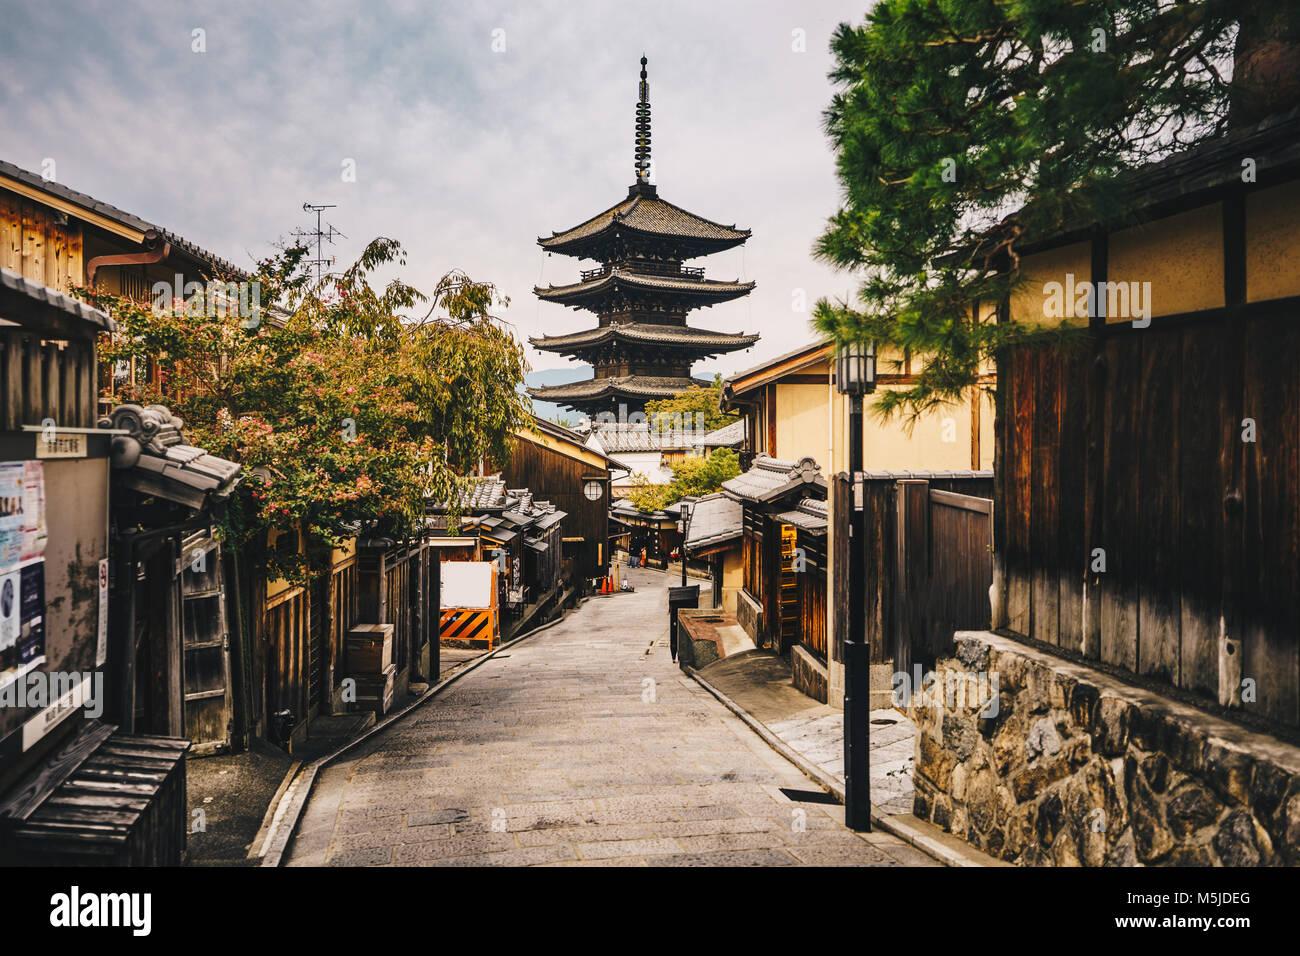 Kyoto old city streets in  Higashiyama District of Kyoto, Japan Stock Photo